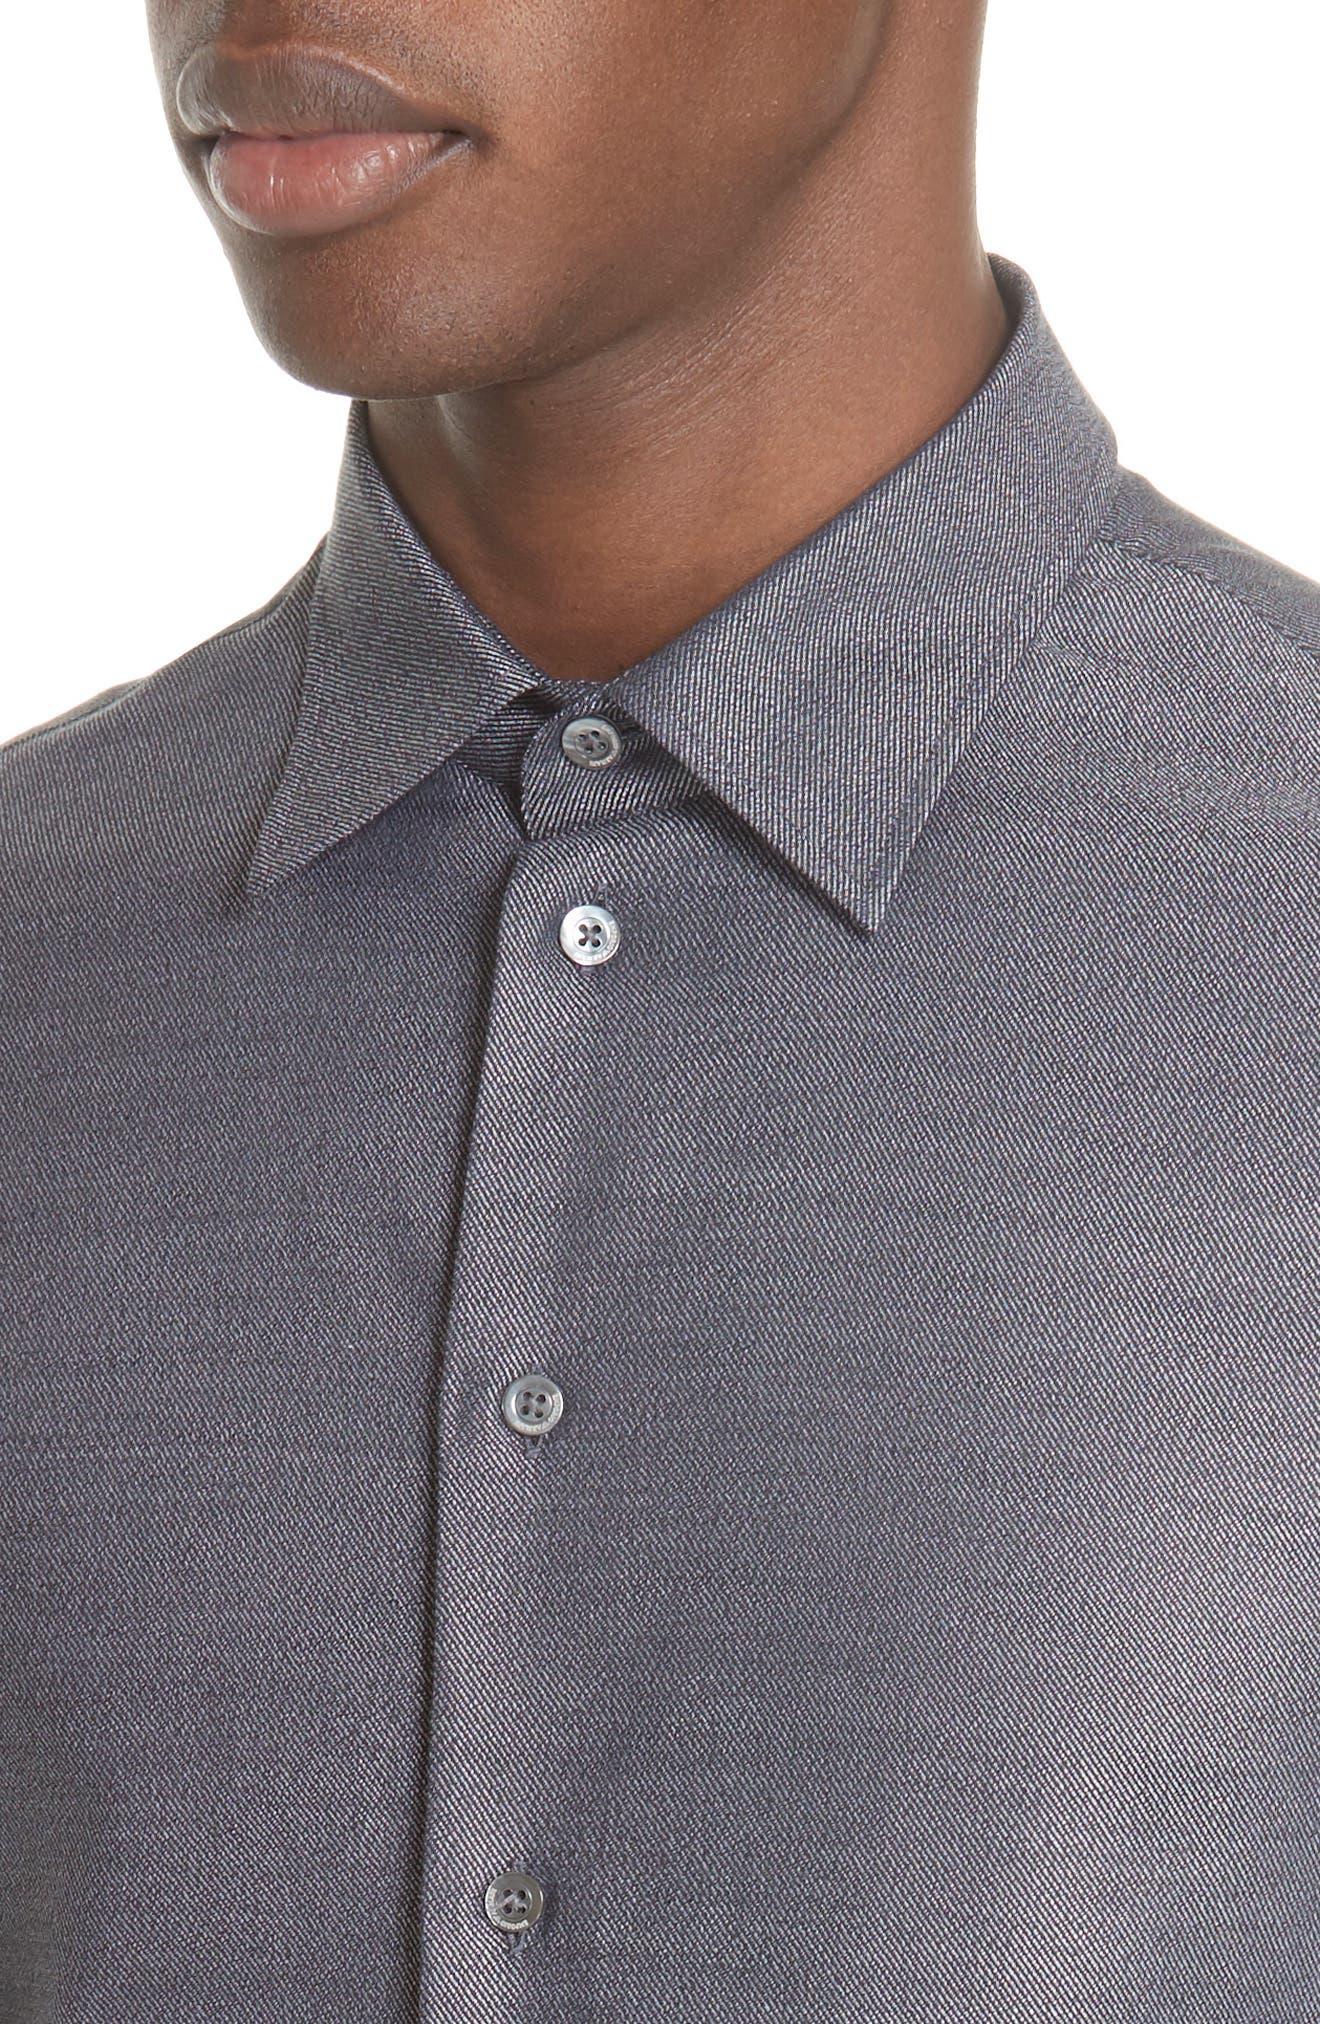 Regular Fit Twill Sport Shirt,                             Alternate thumbnail 4, color,                             GREY MULTI